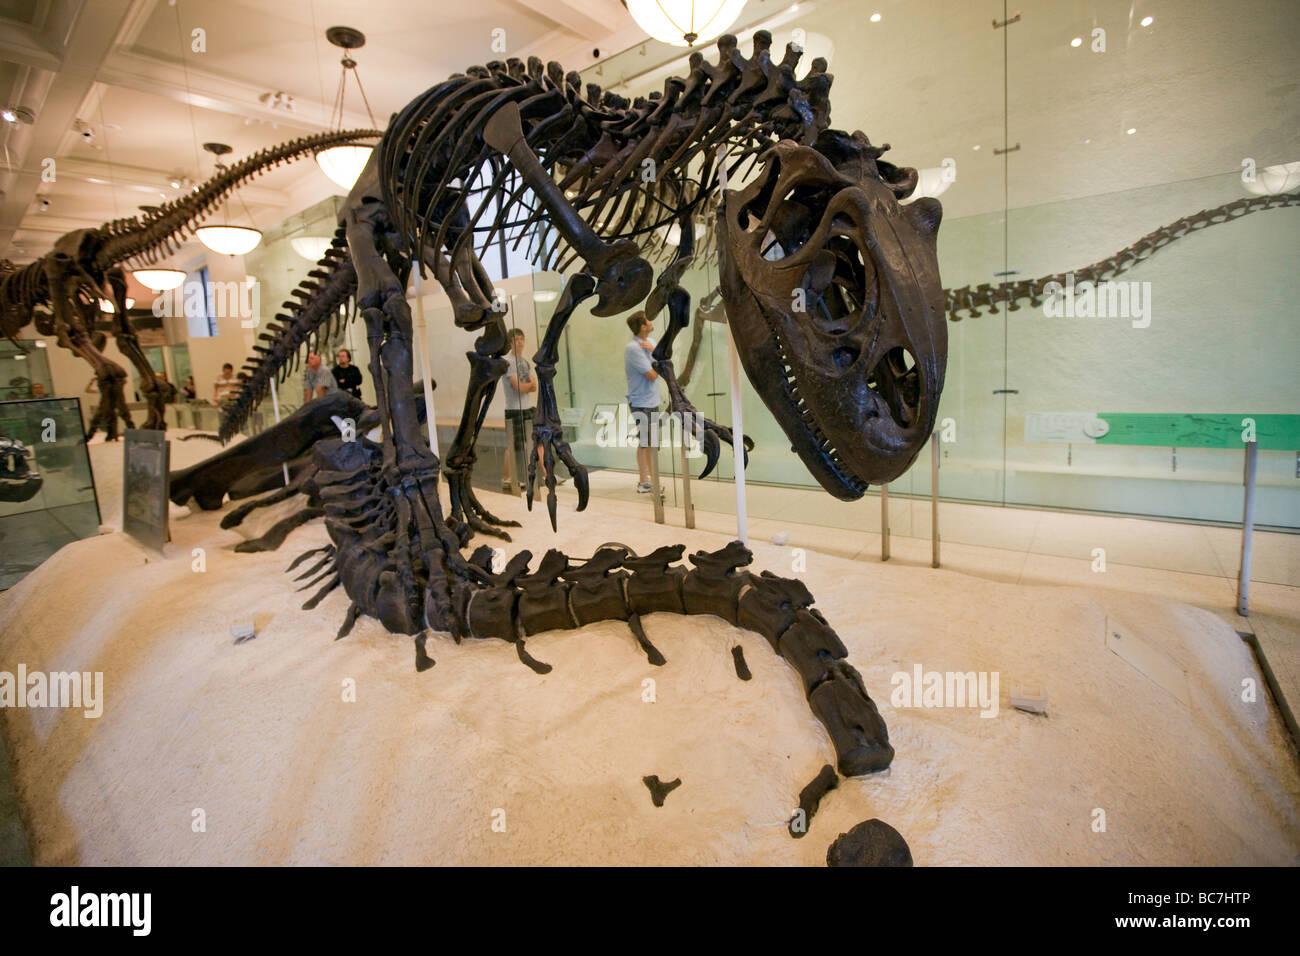 Le dinosaure Allosaurus à Exhibit Museum of Natural History NEW YORK Photo Stock